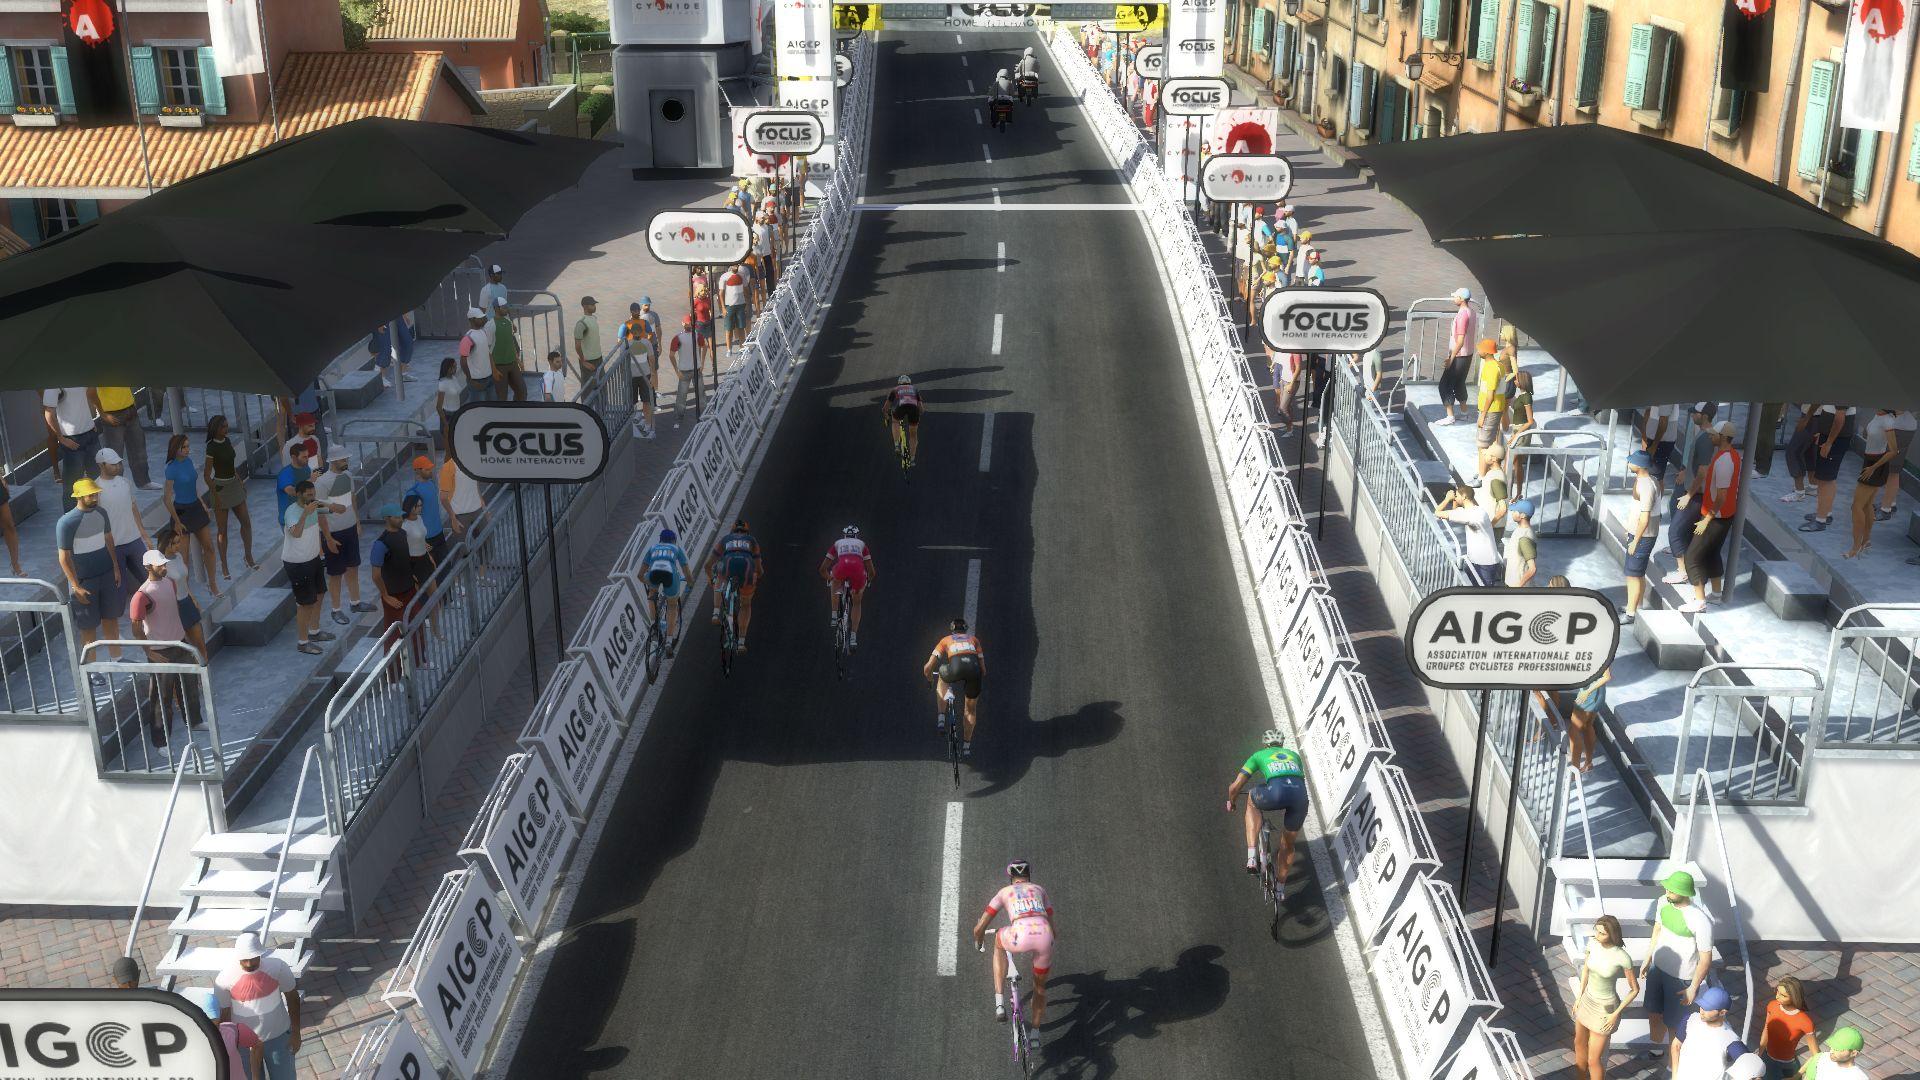 pcmdaily.com/images/mg/2019/Races/PT/Tirreno/mg19_ta_s07_24.jpg